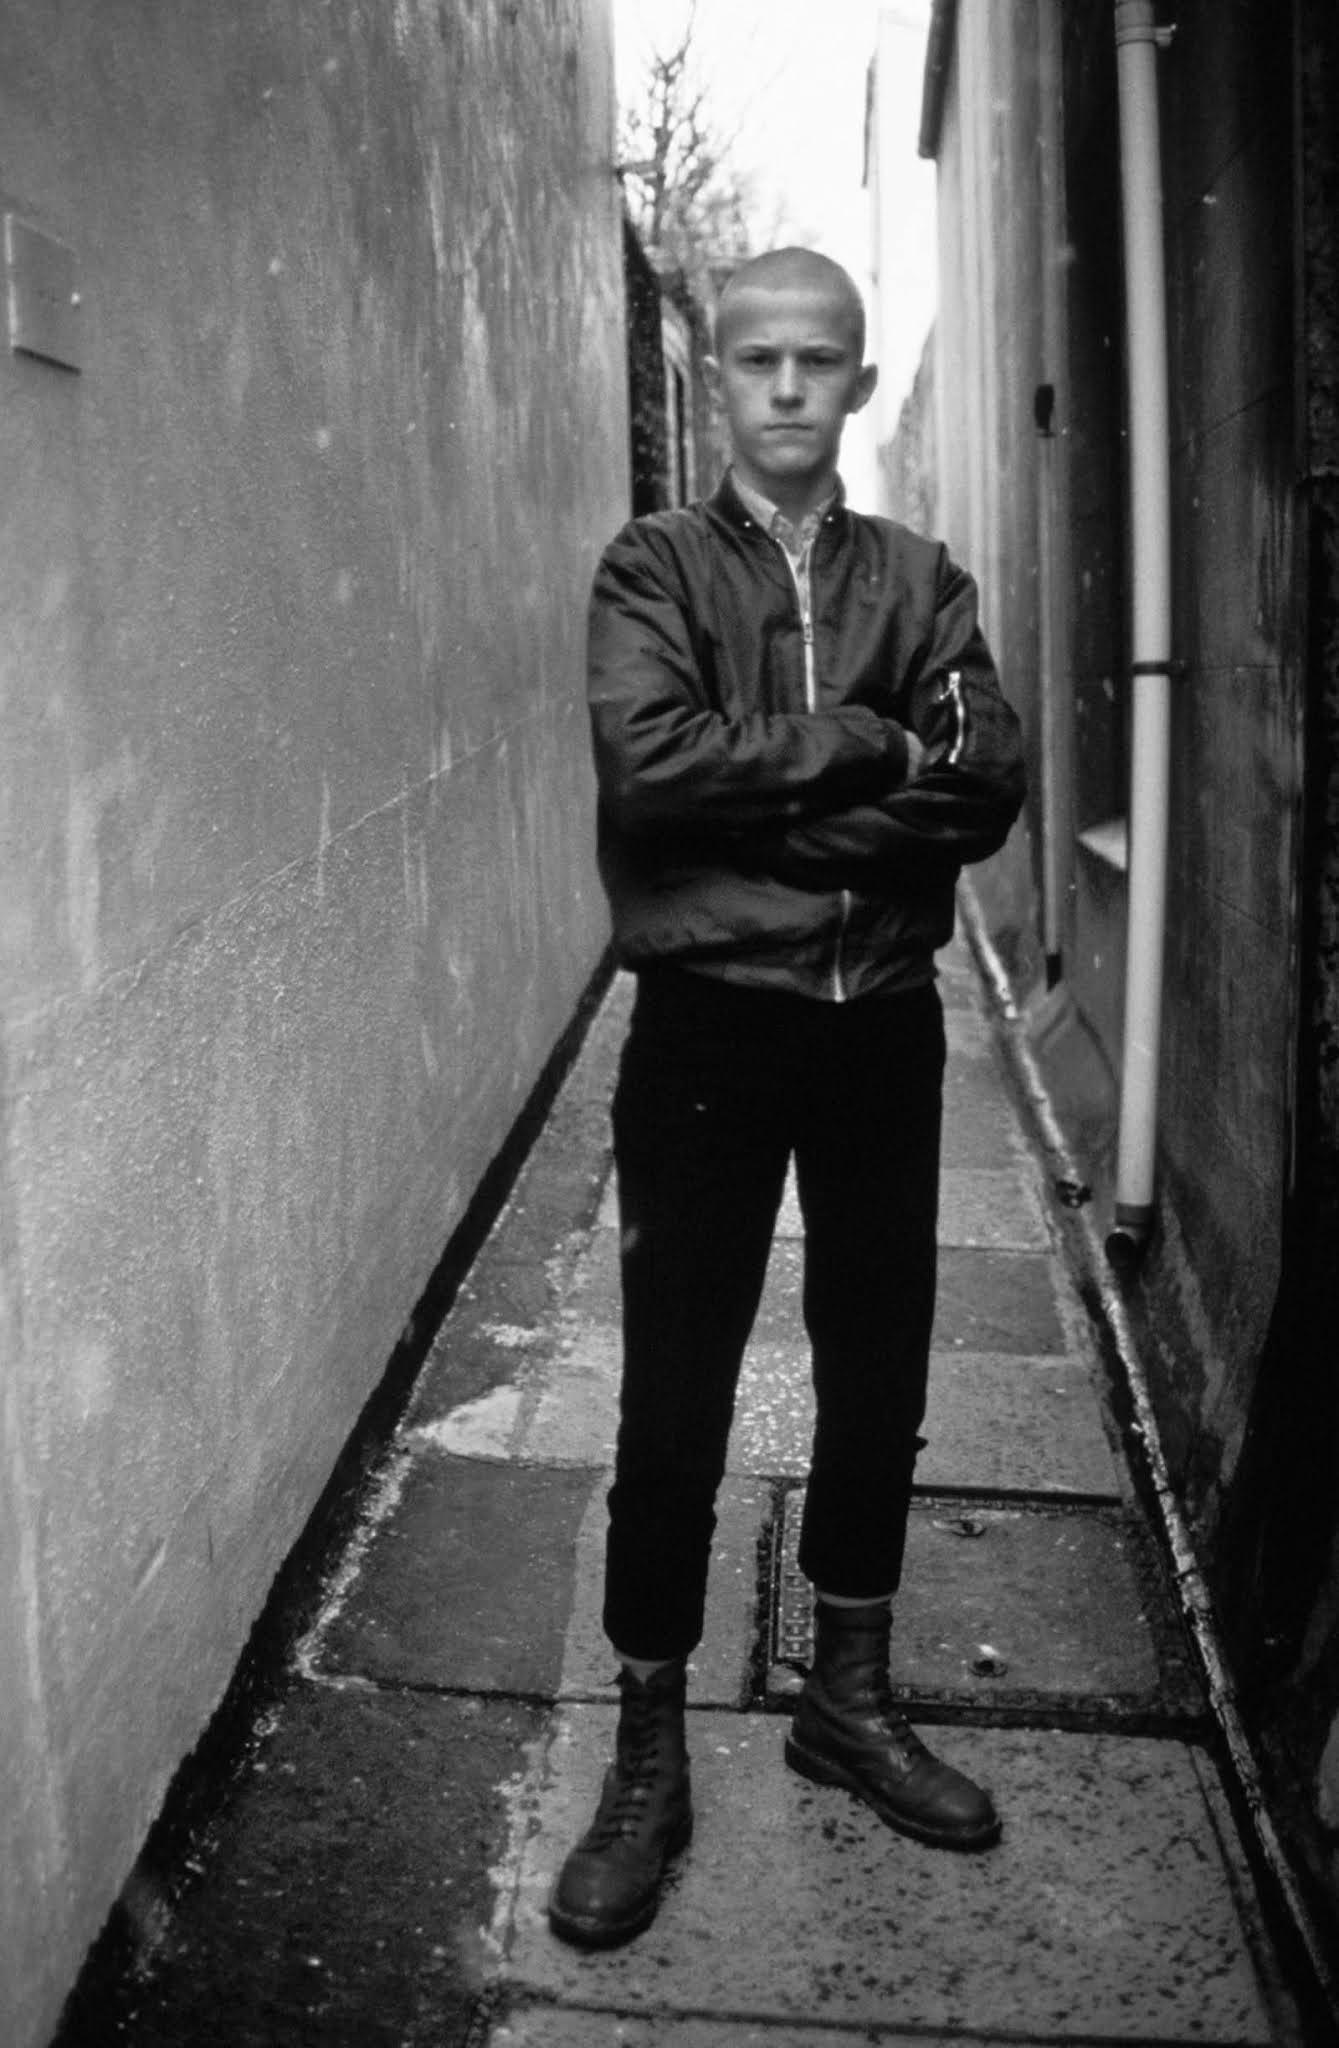 british skinhead subculture photographs